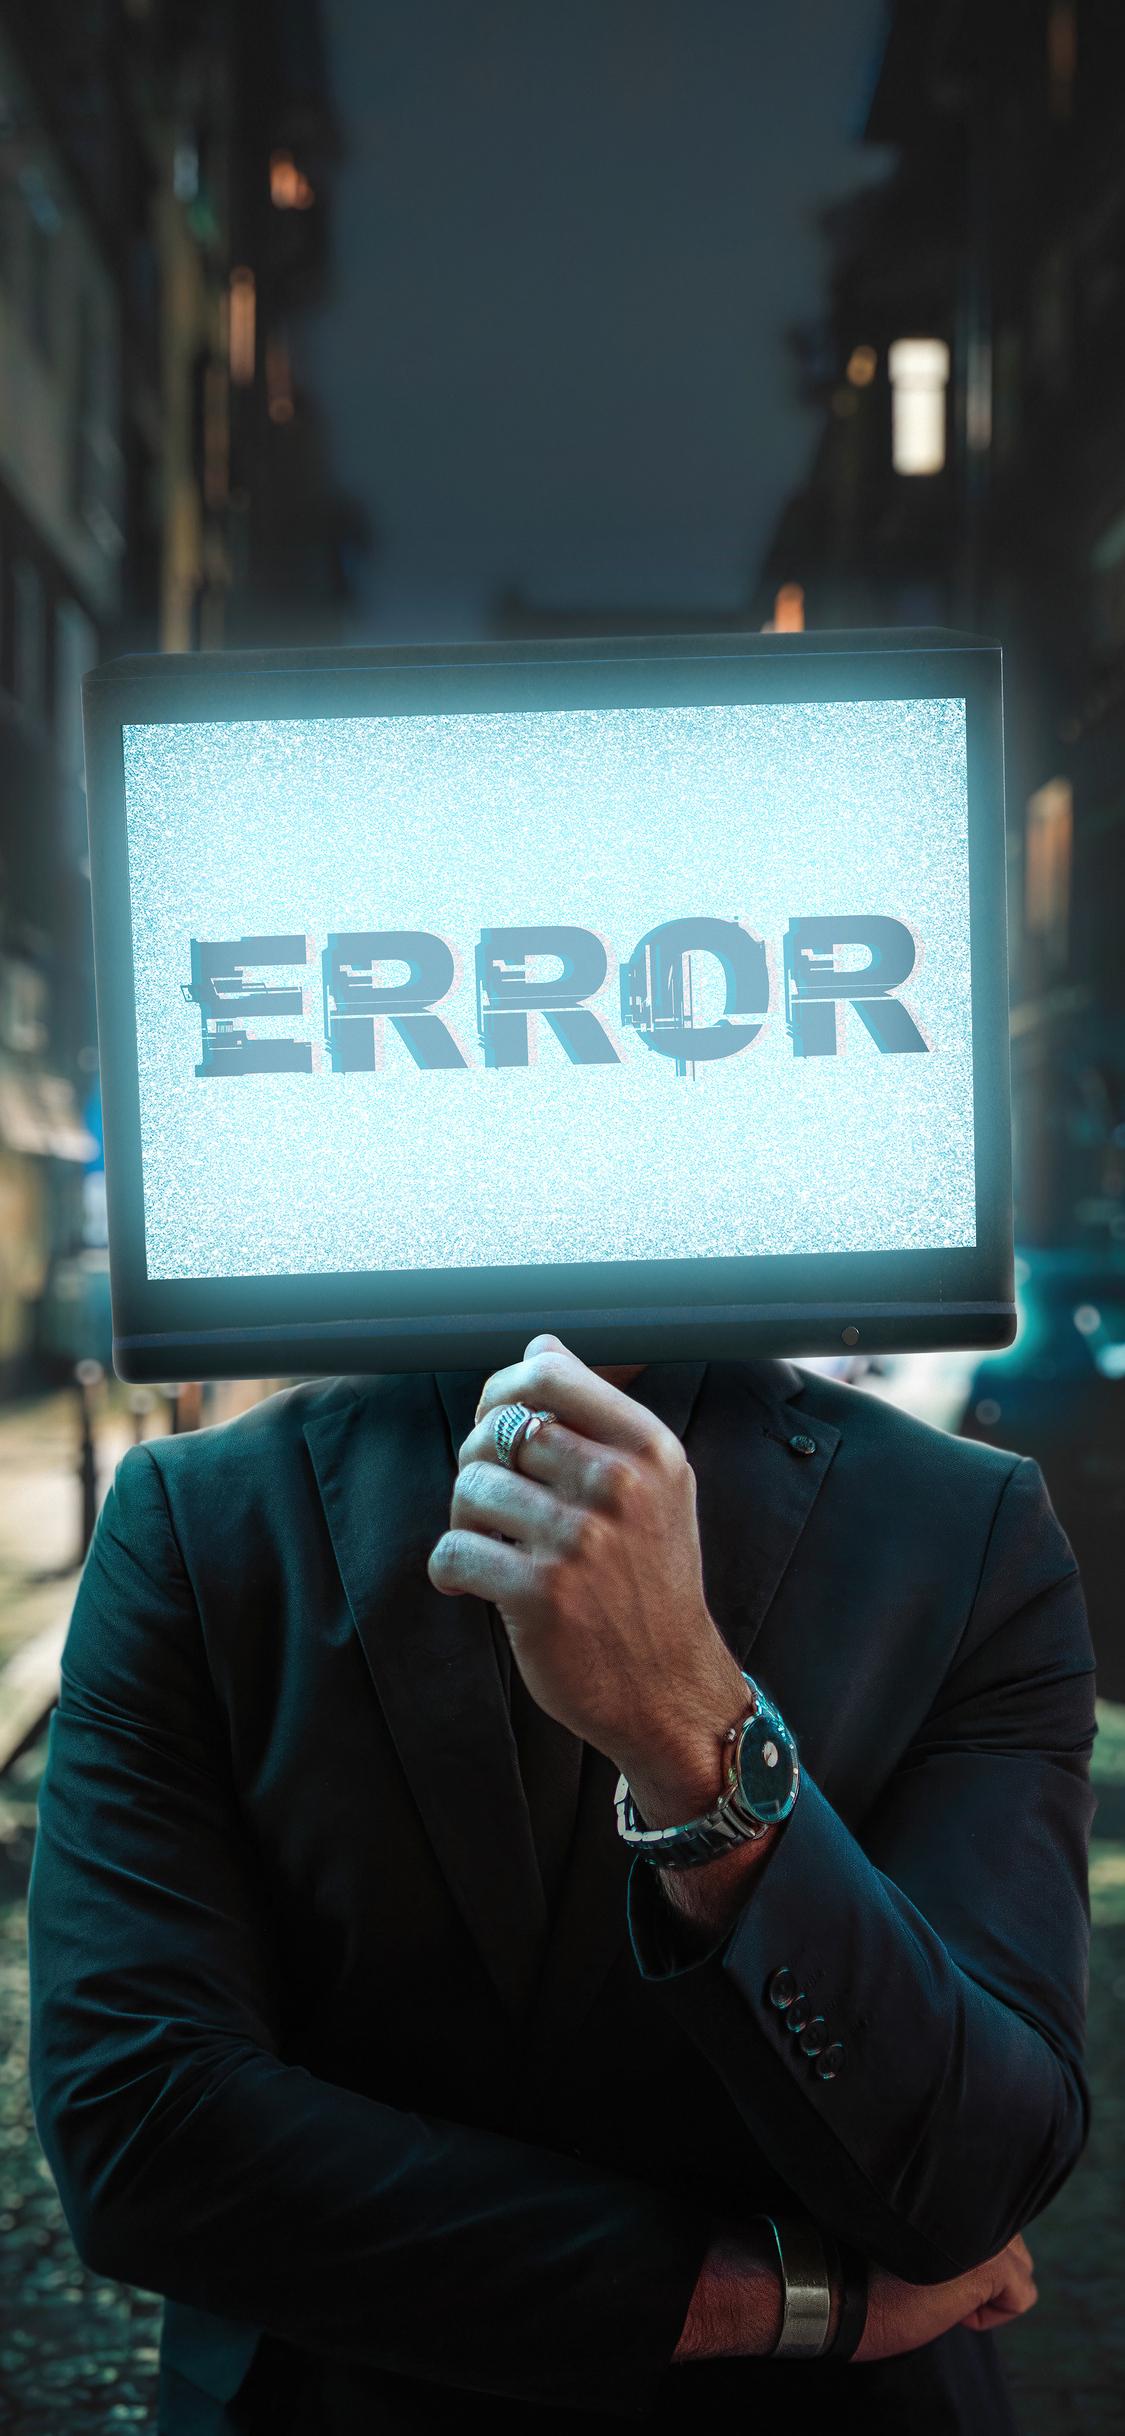 error-tv-face-5k-6c.jpg